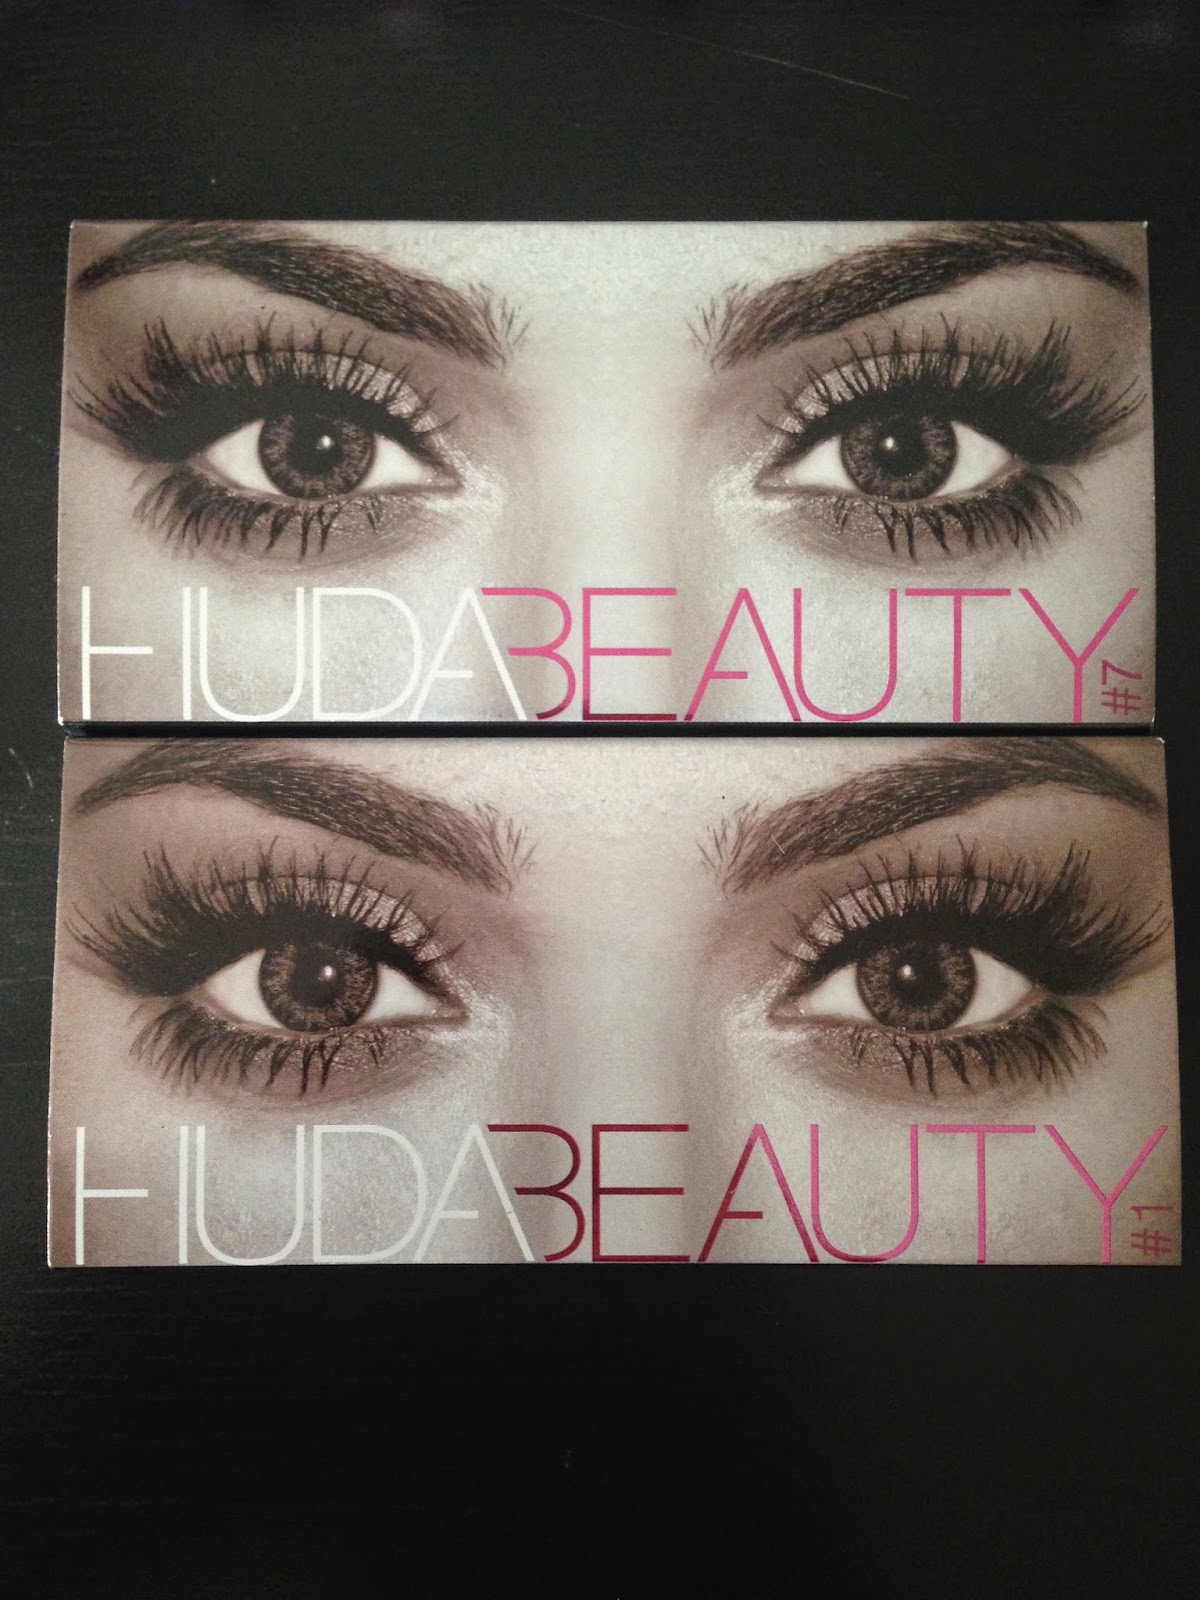 875928fa2b5 ... +Huda Kattan eyes. Giselle are the #1. Samantha are the #7